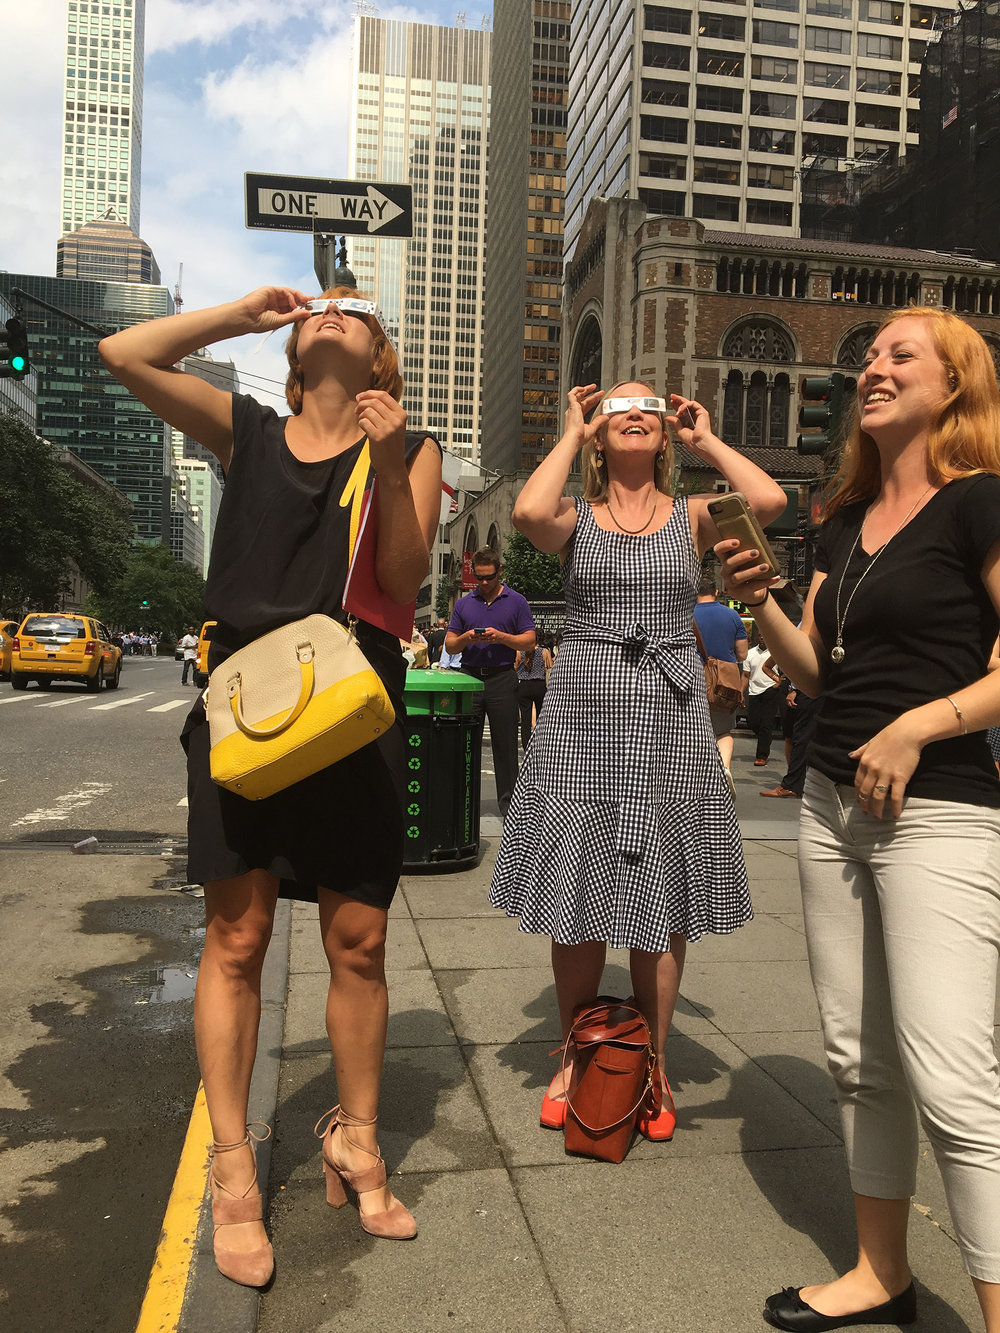 Eclipse watching in NYC Photographer: Erin Buchanan